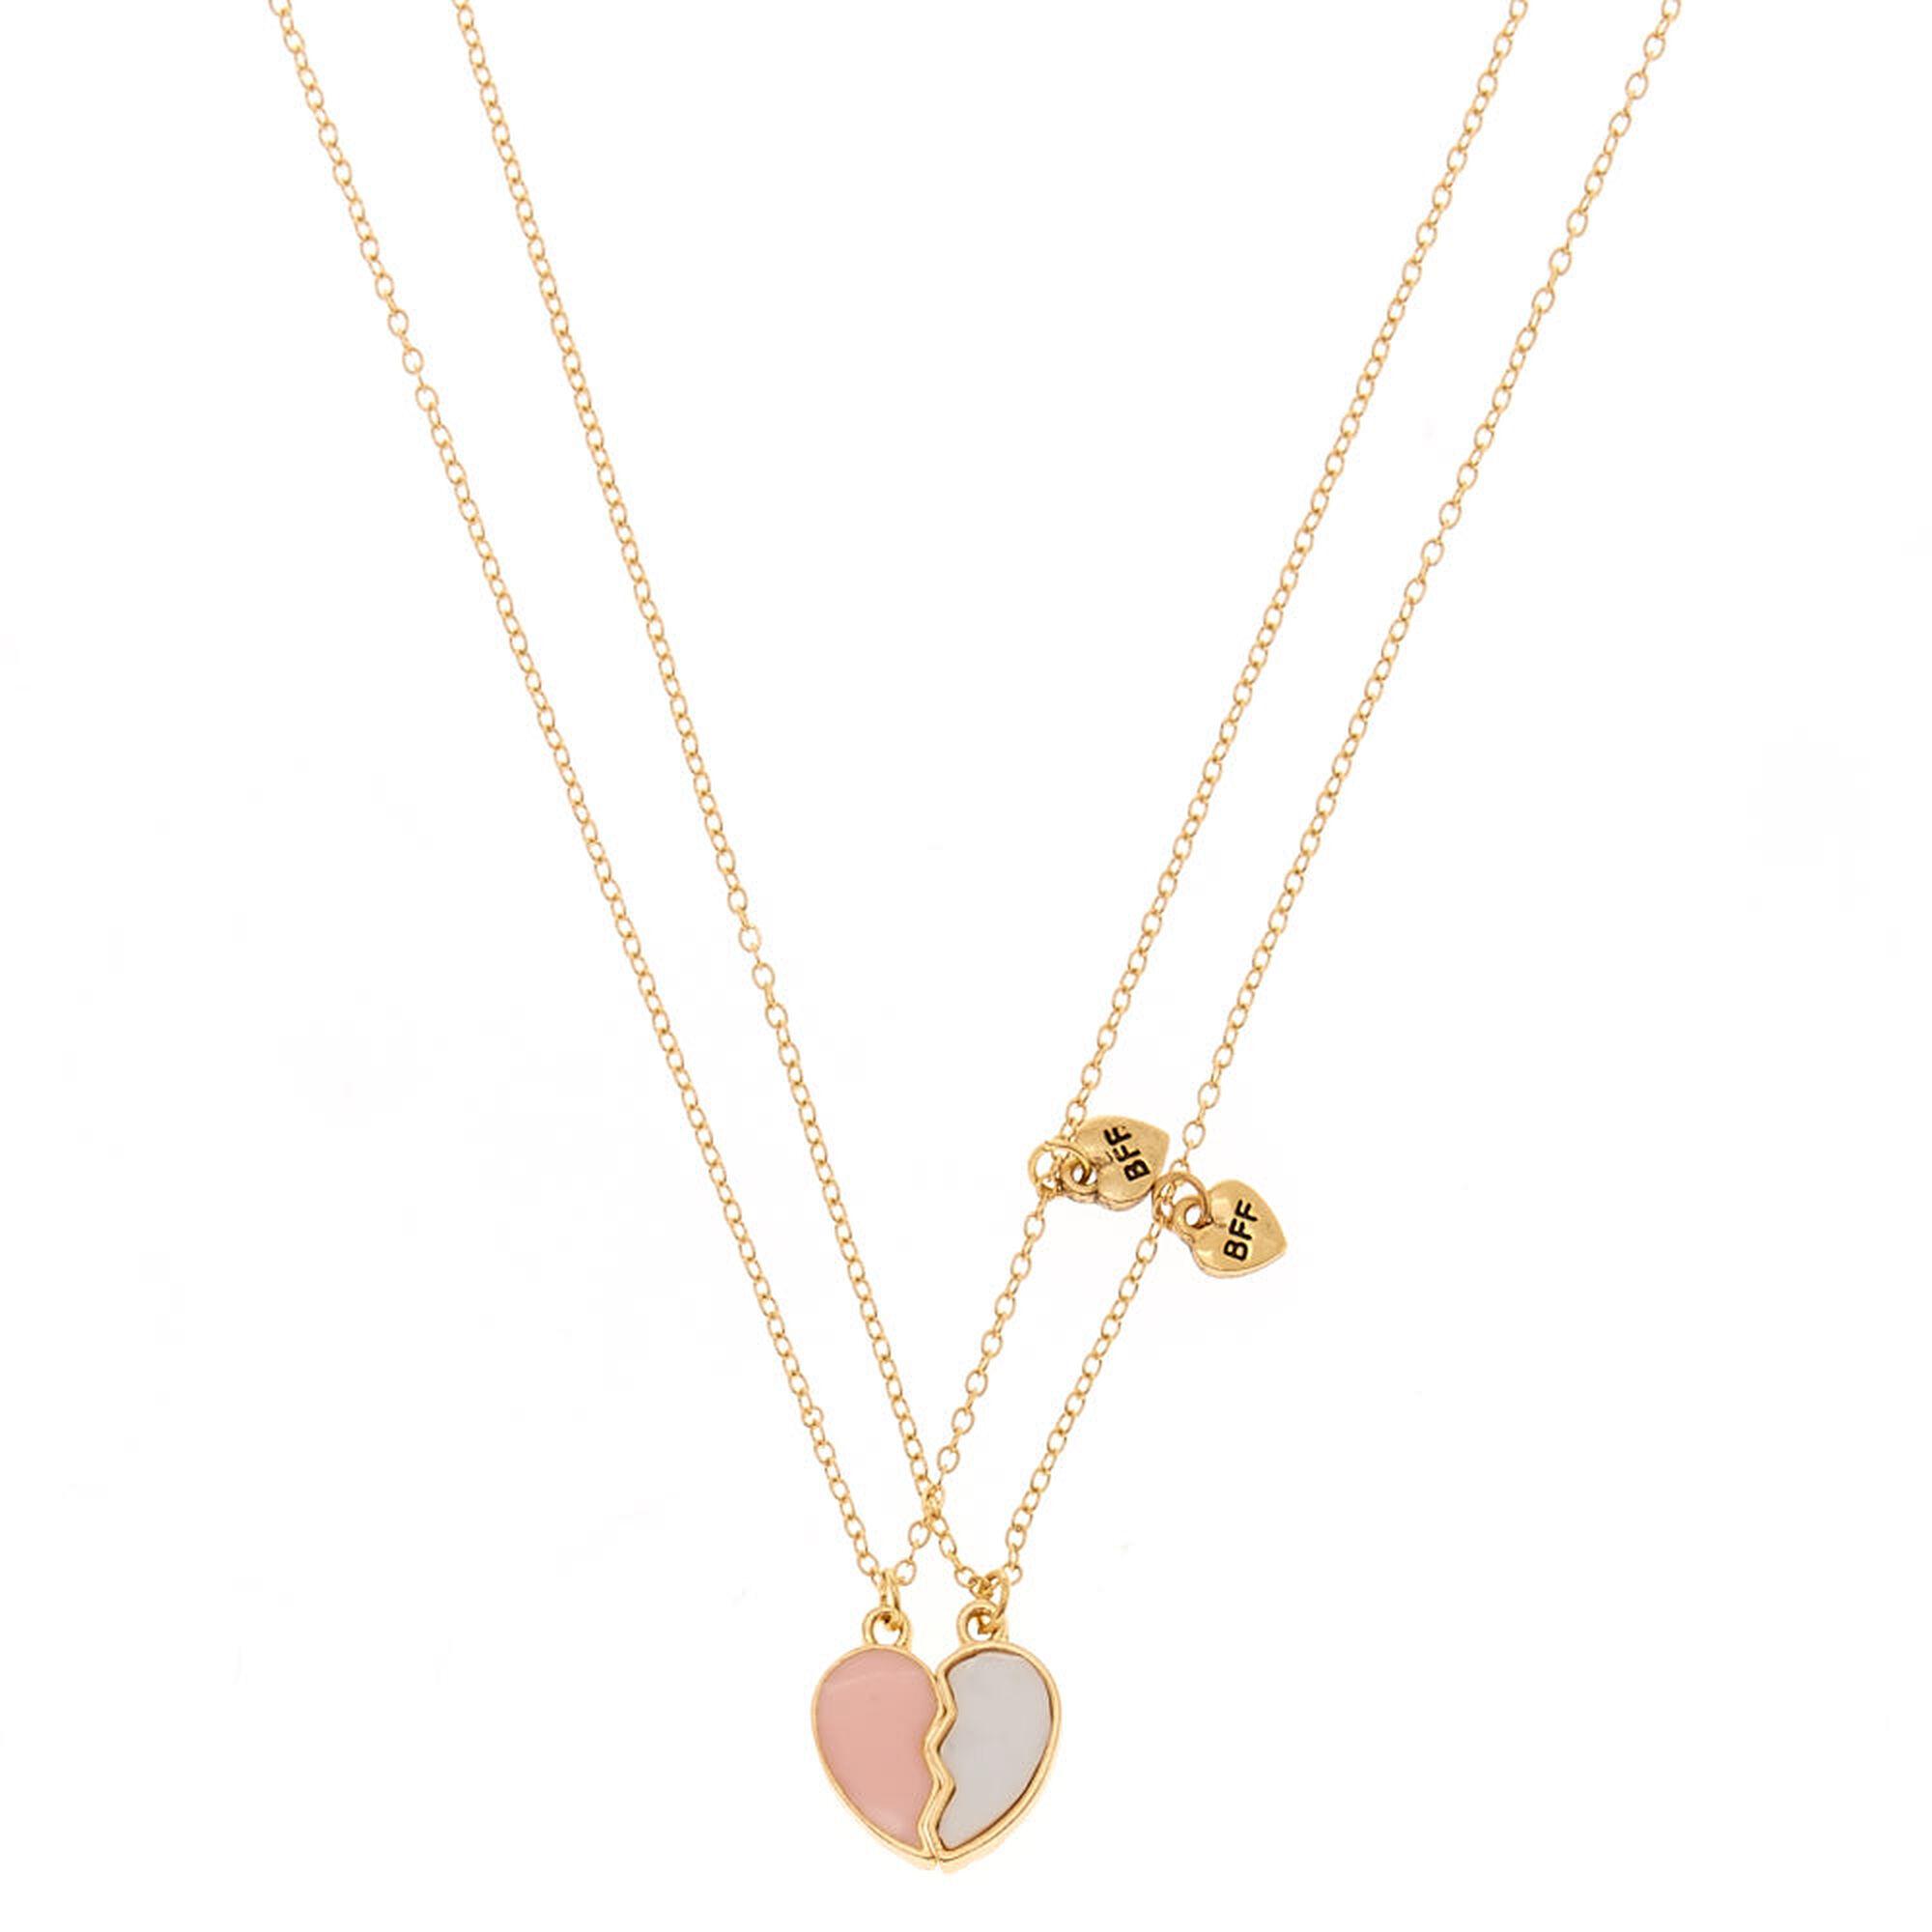 1eca0efbbc Best Friends Broken Heart Pendant Necklaces - Pink, 2 Pack   Icing US